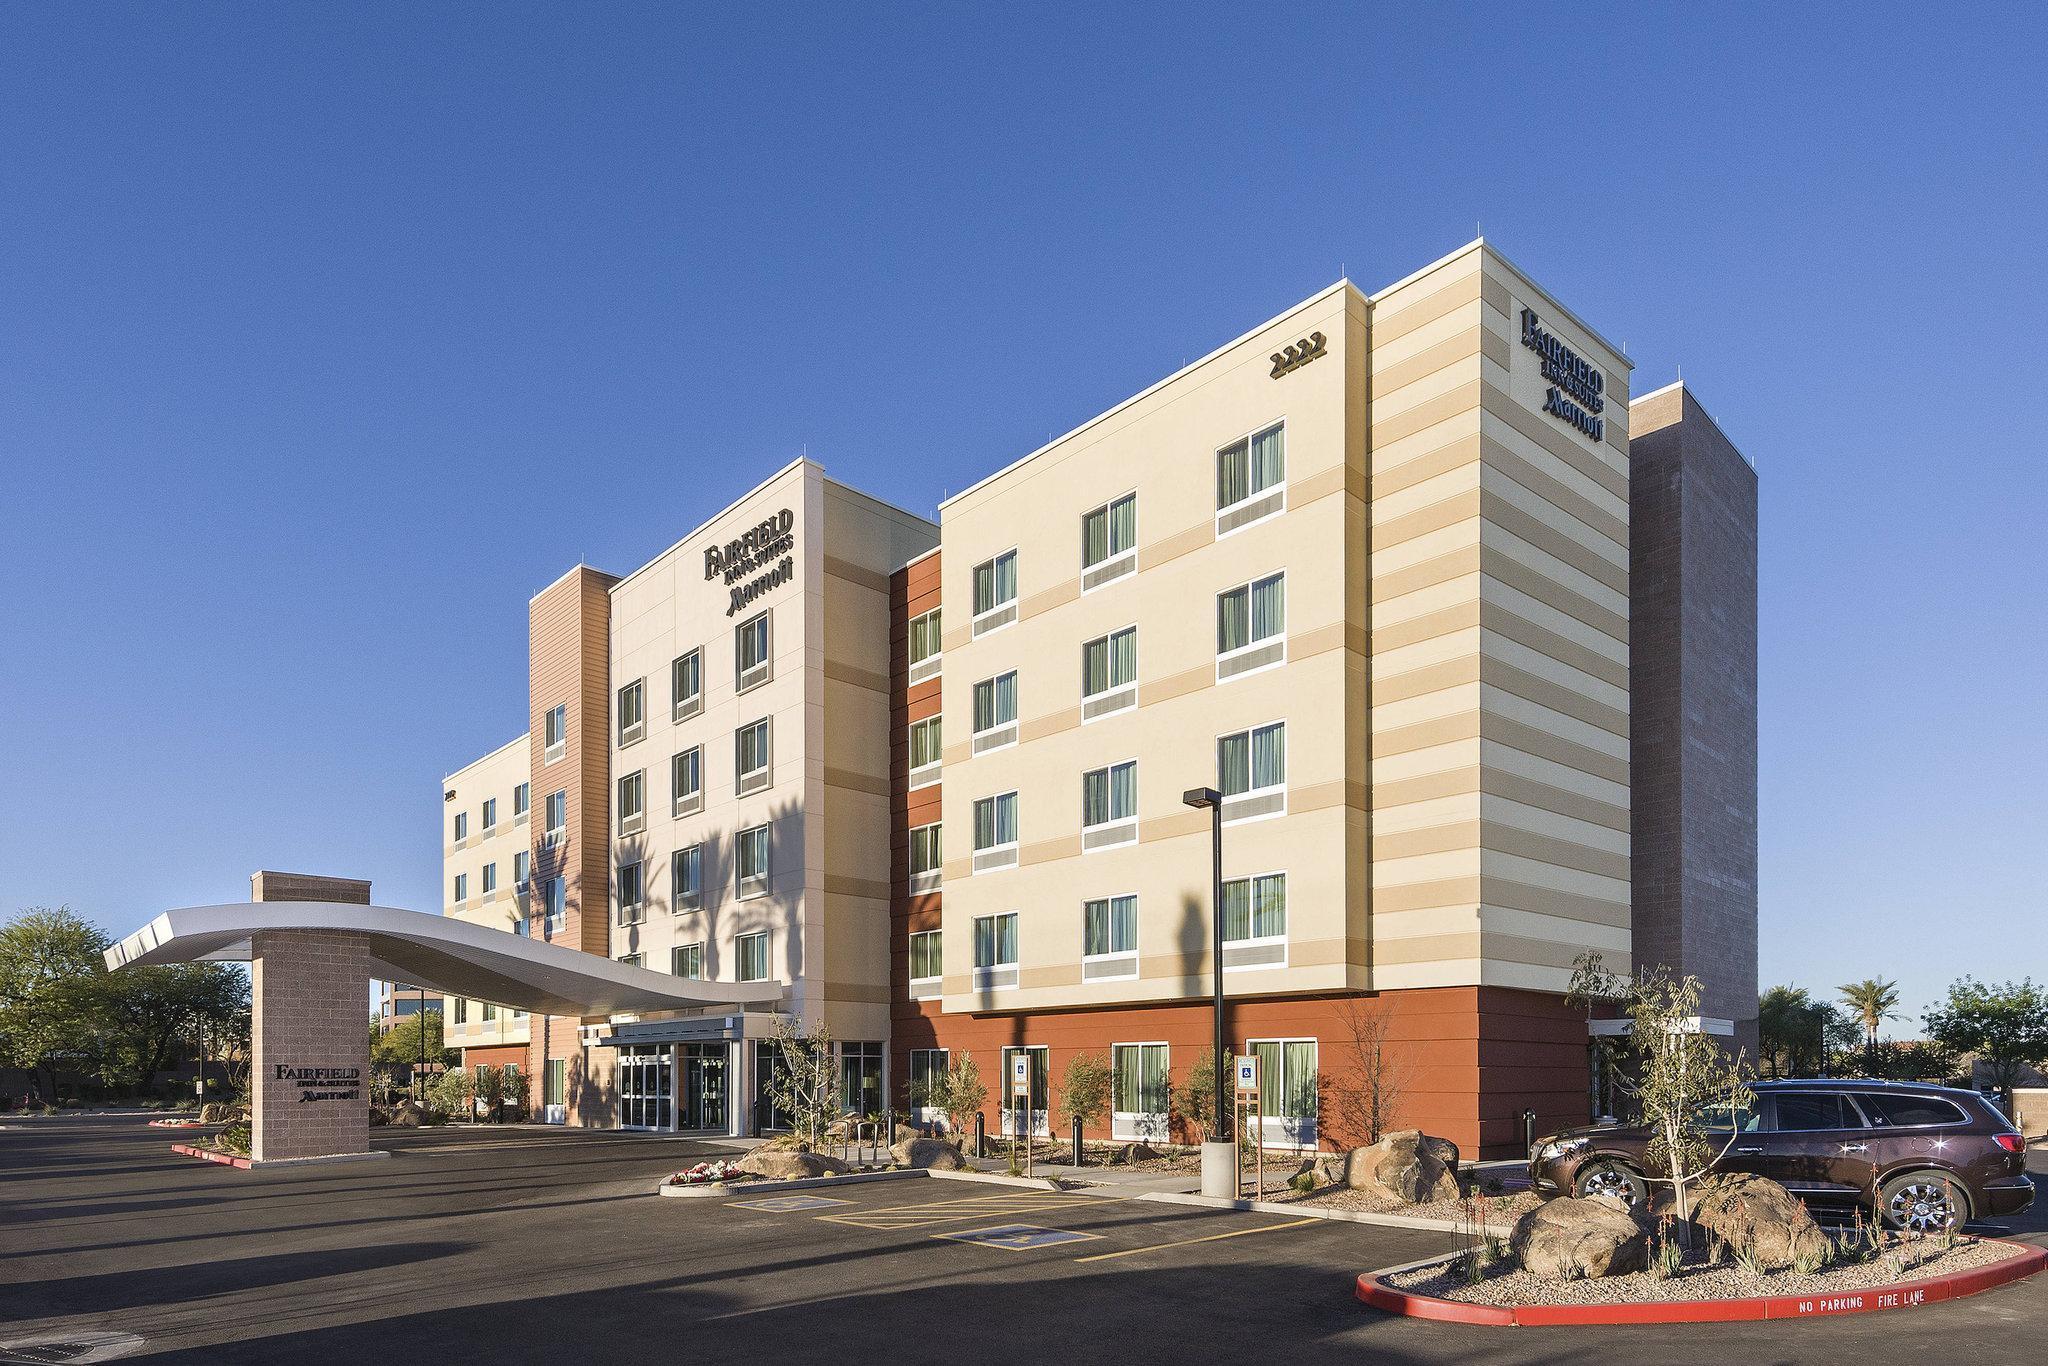 Fairfield Inn And Suites Phoenix Tempe Airport